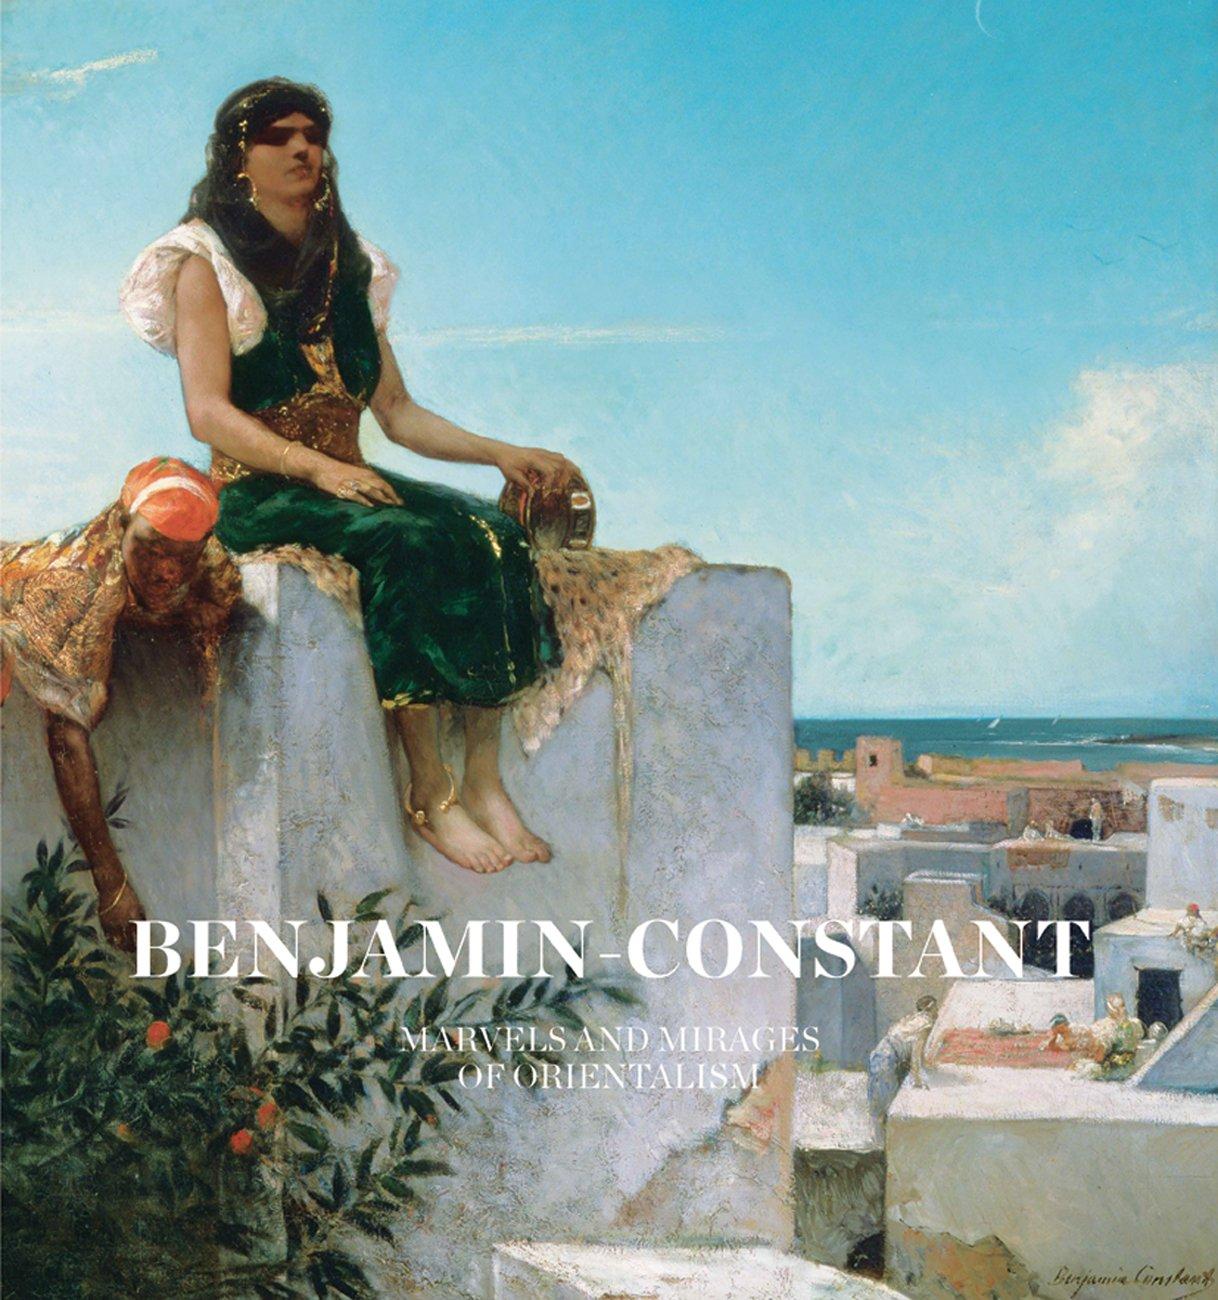 Benjamin-Constant: Marvels and Mirages of Orientalism por Nathalie Bondil